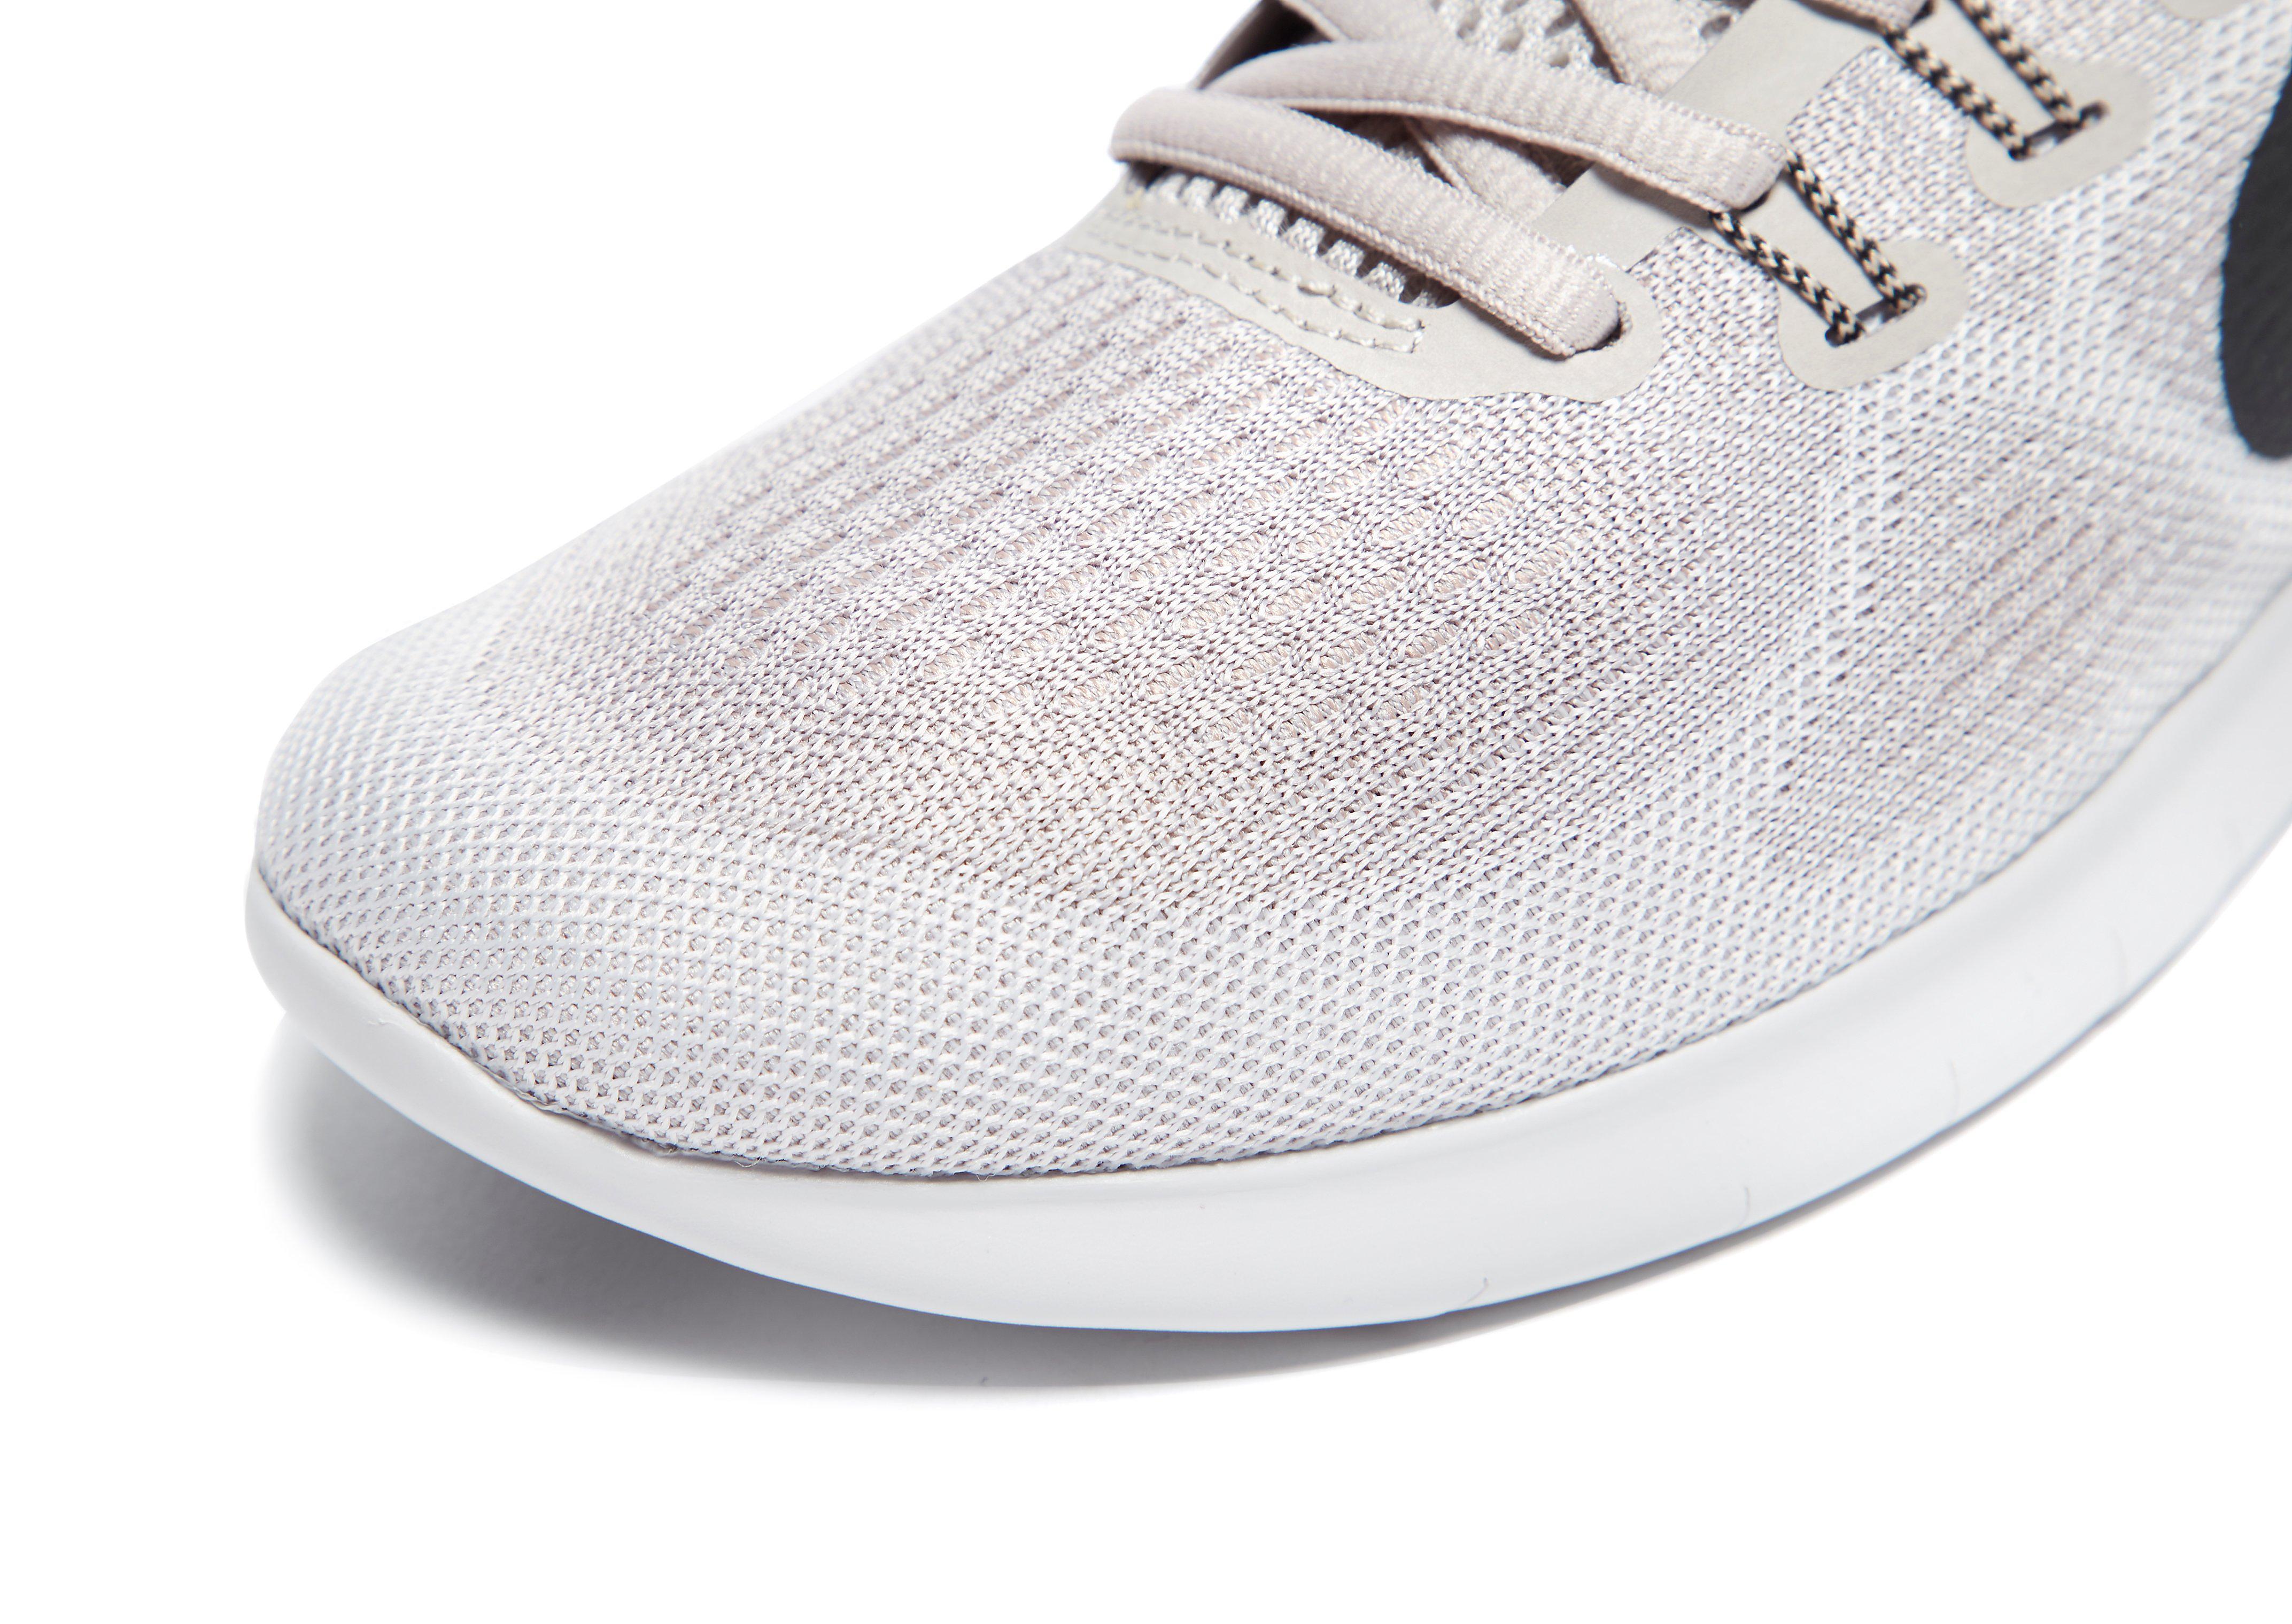 Nike Free RN Dames